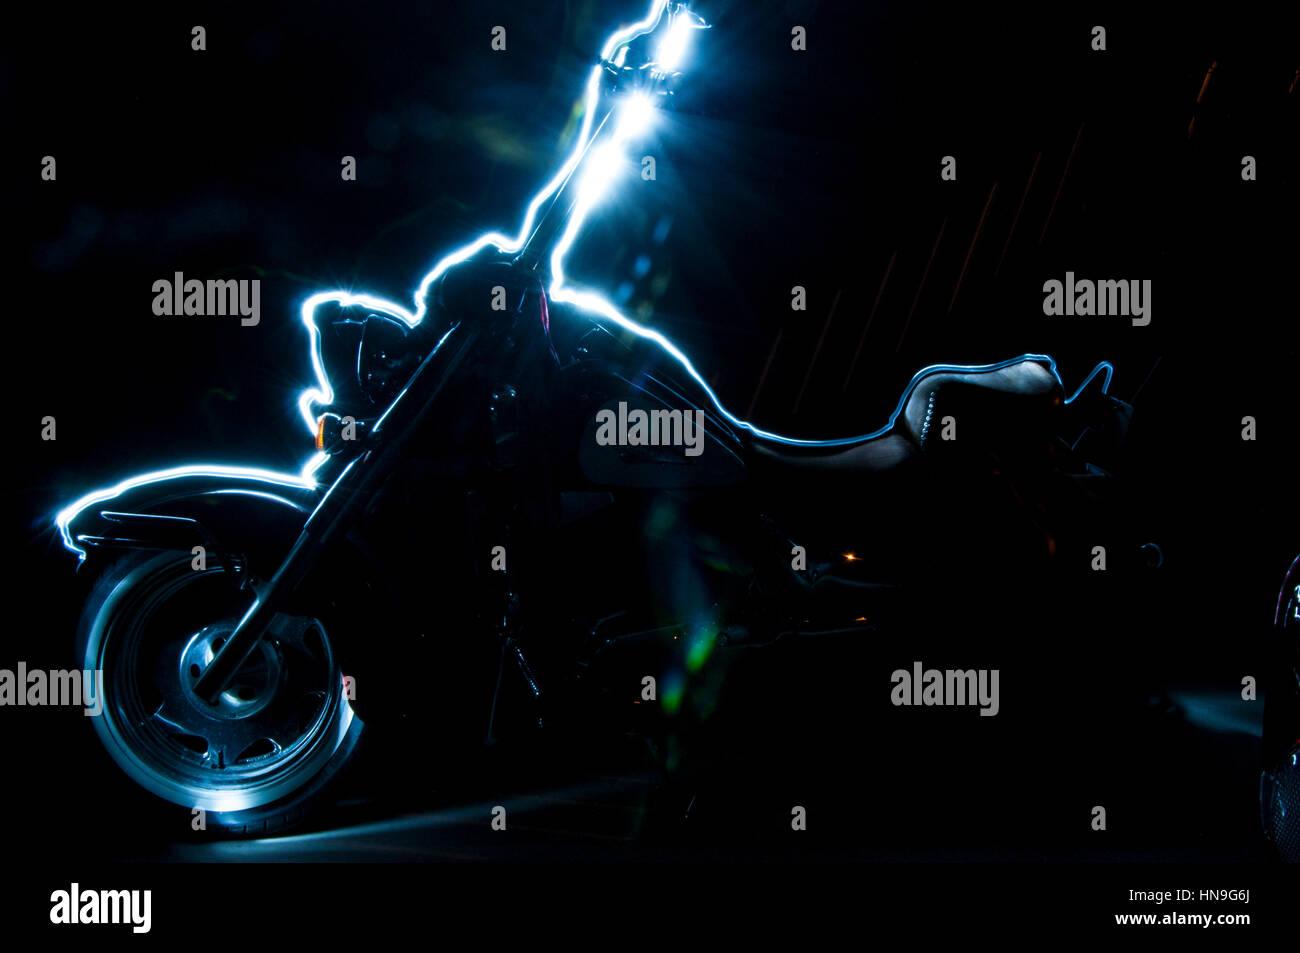 Moto light painting Banque D'Images